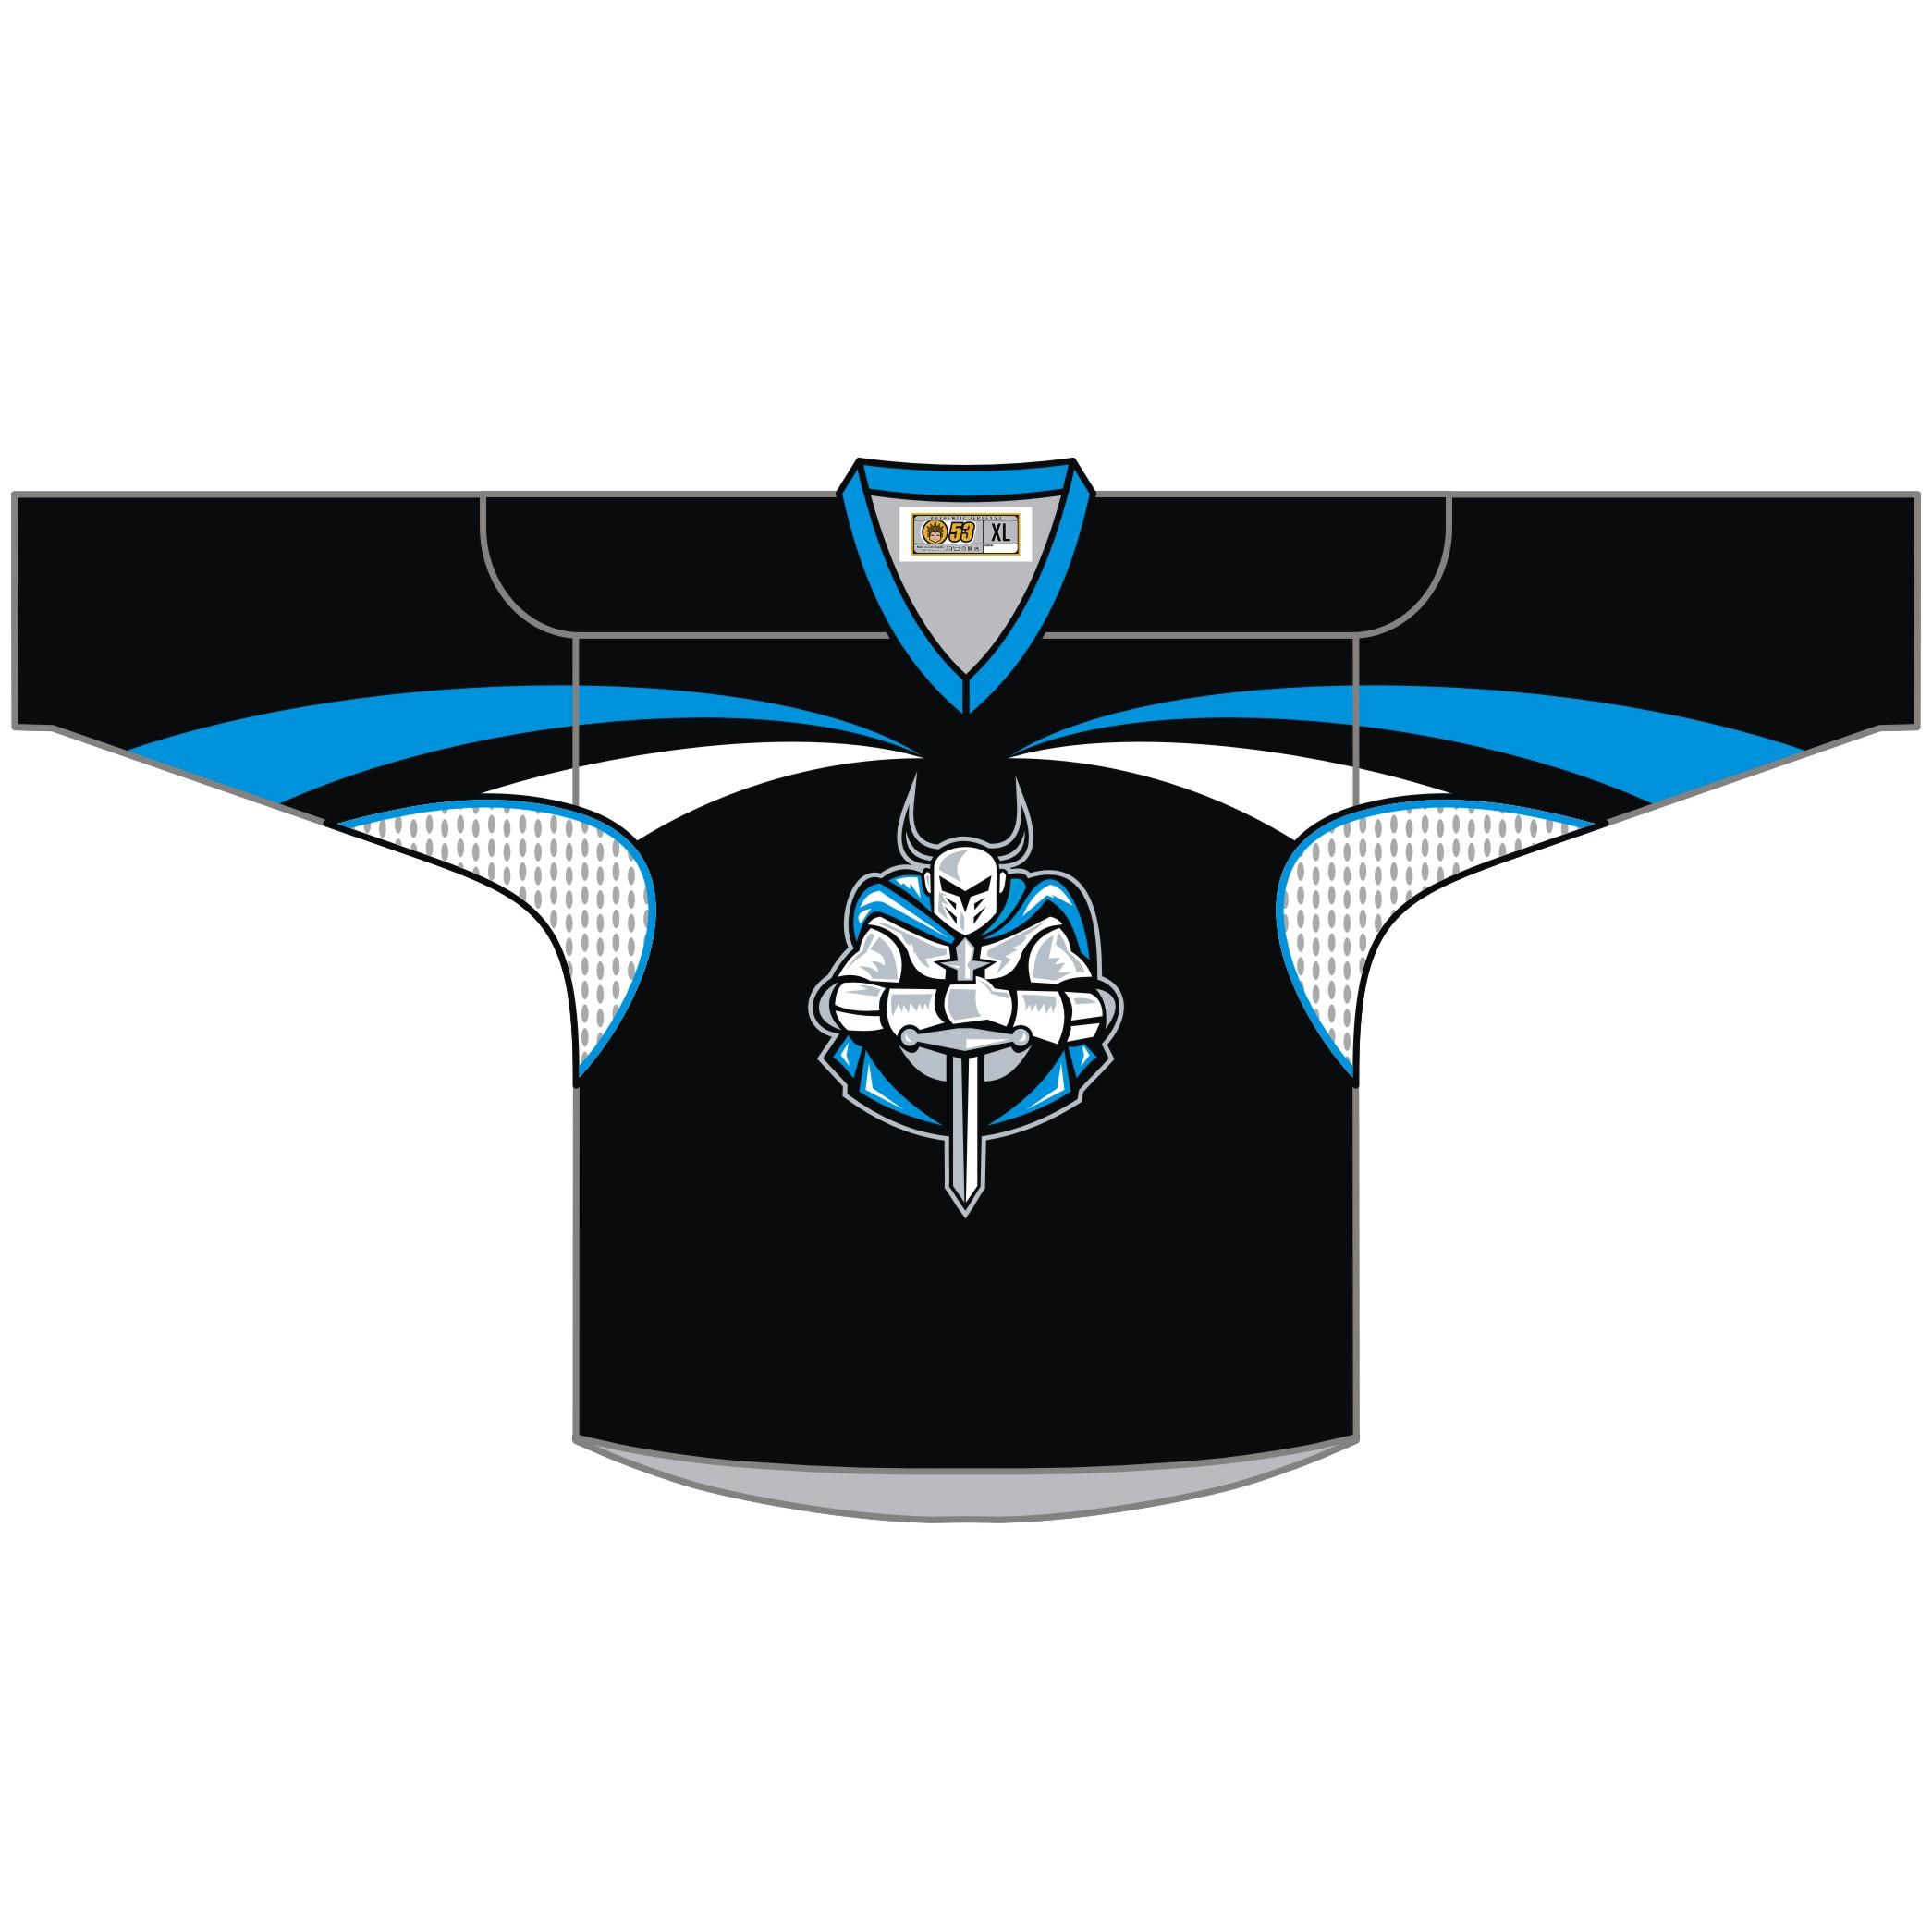 881ca9171 ... hockey mission pro kulate sedlo limec v plus - design 01 ...